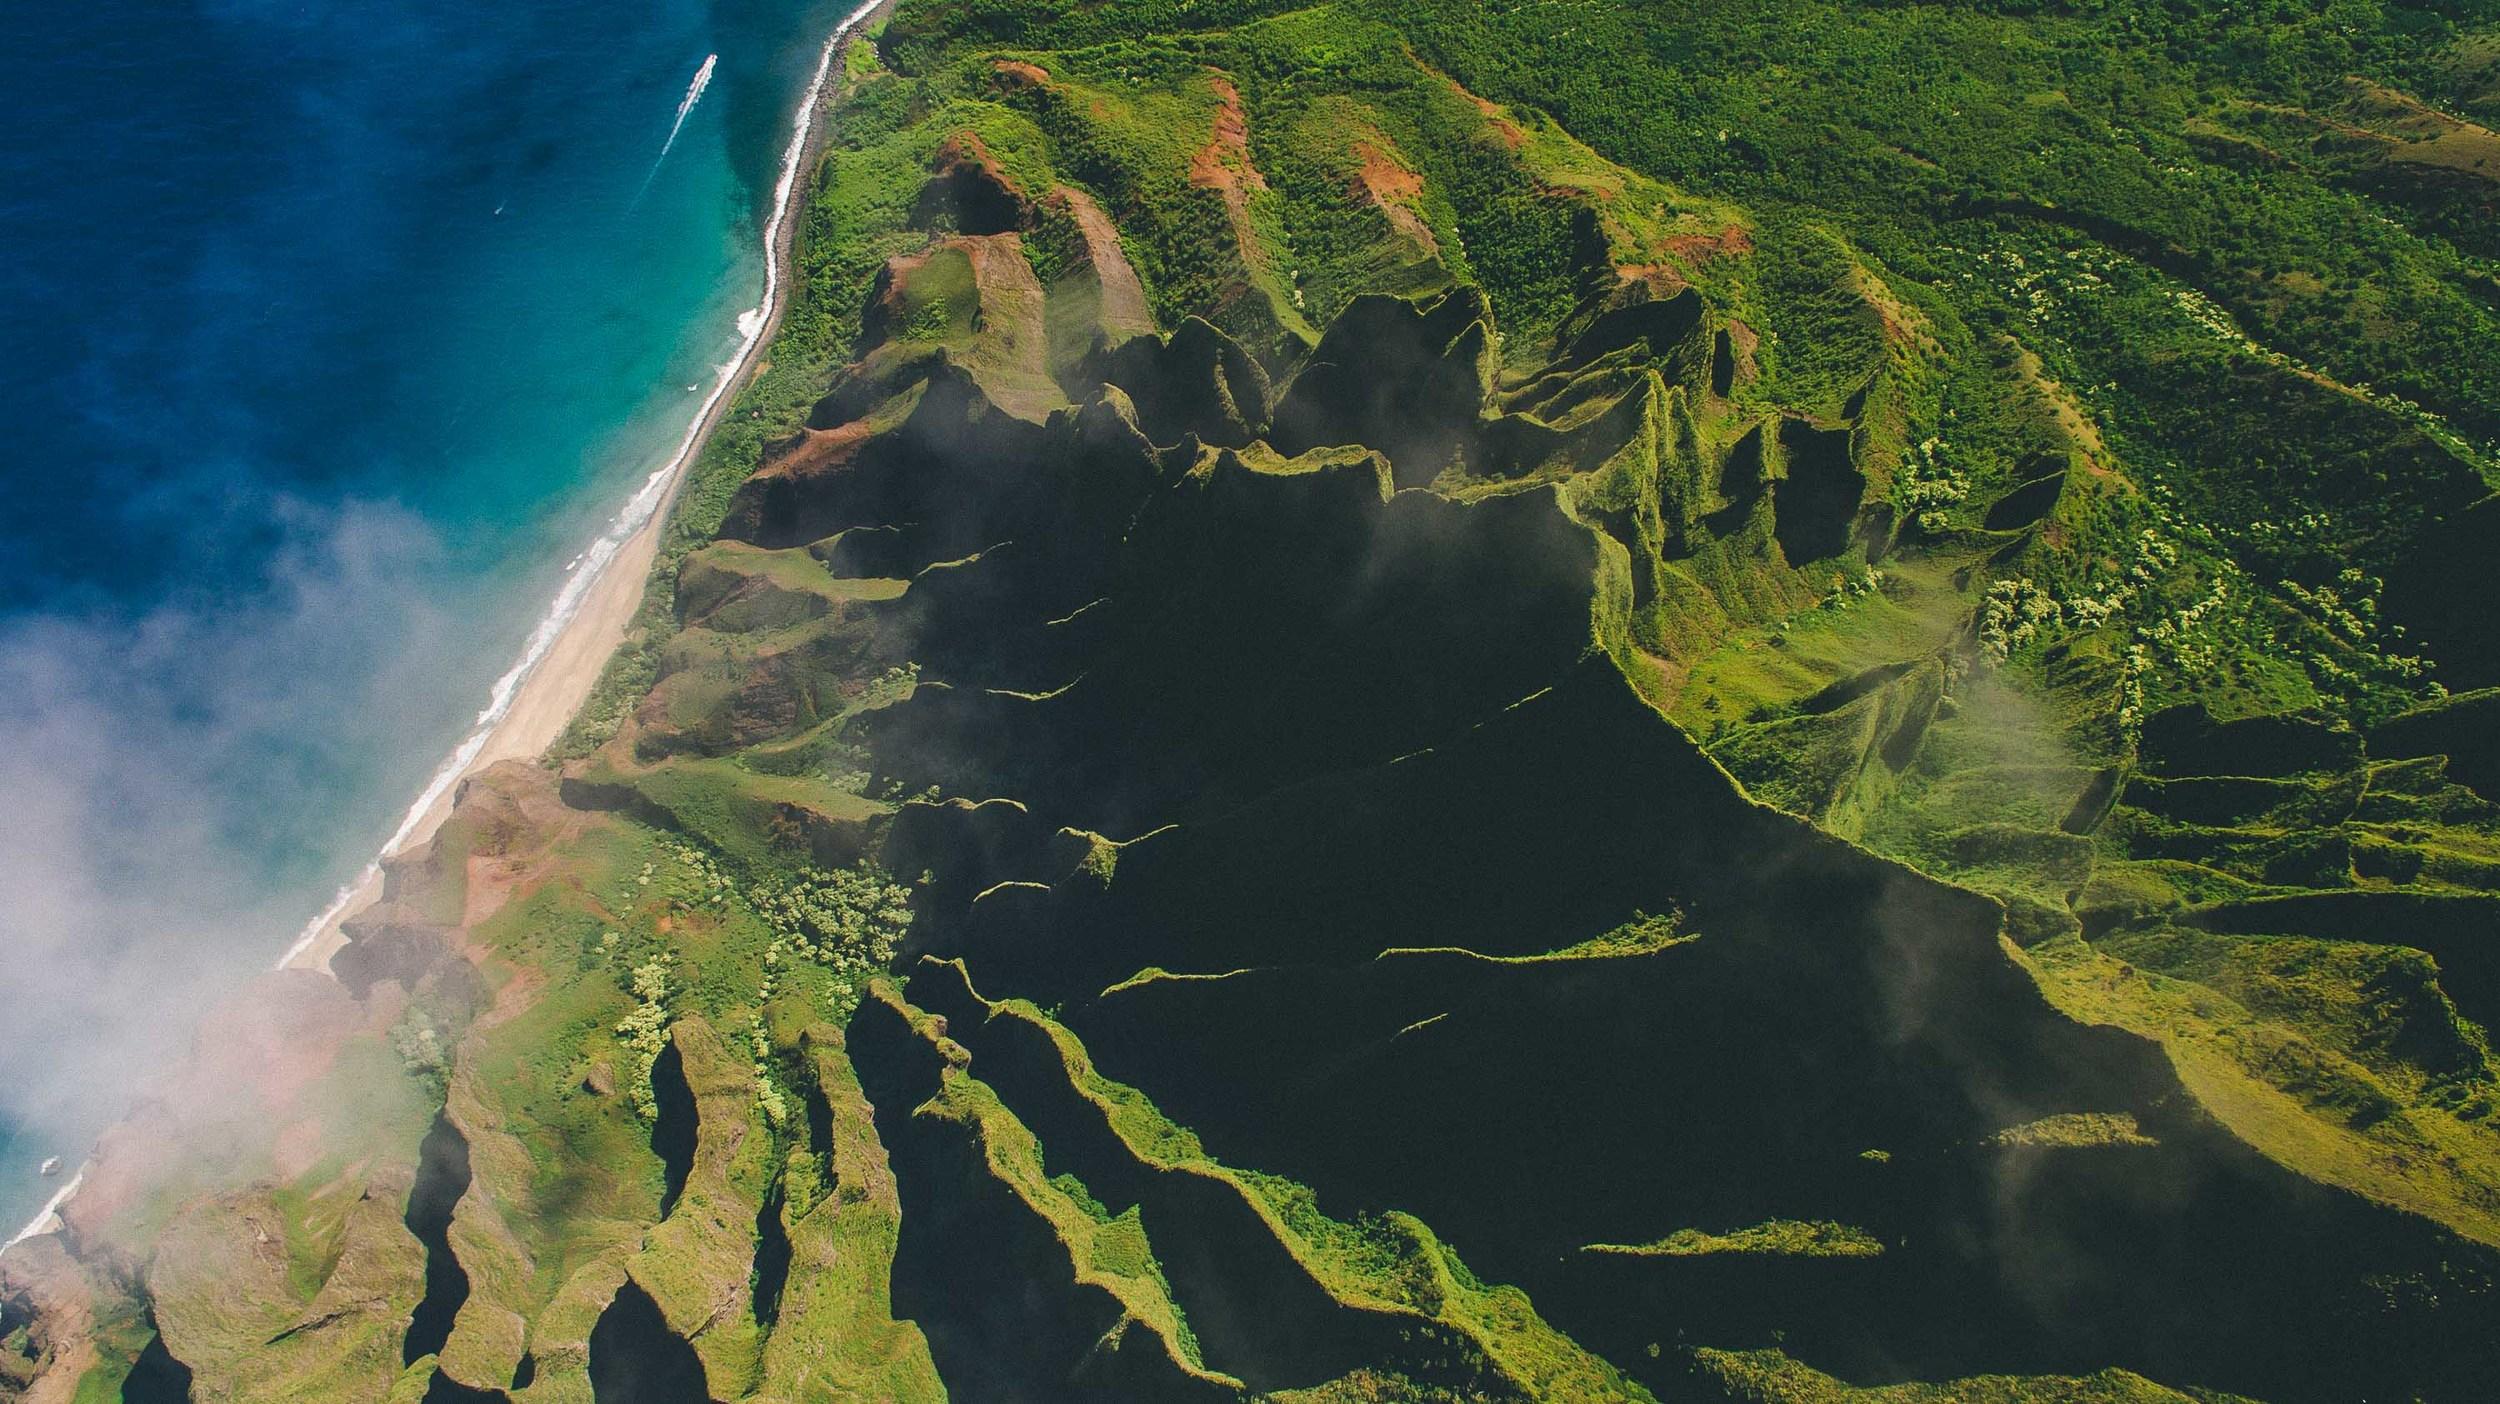 bryce-johnson-kalalau-ridge-kauai-hiking-hammock-palmwood-aloha-exchange-11.jpg